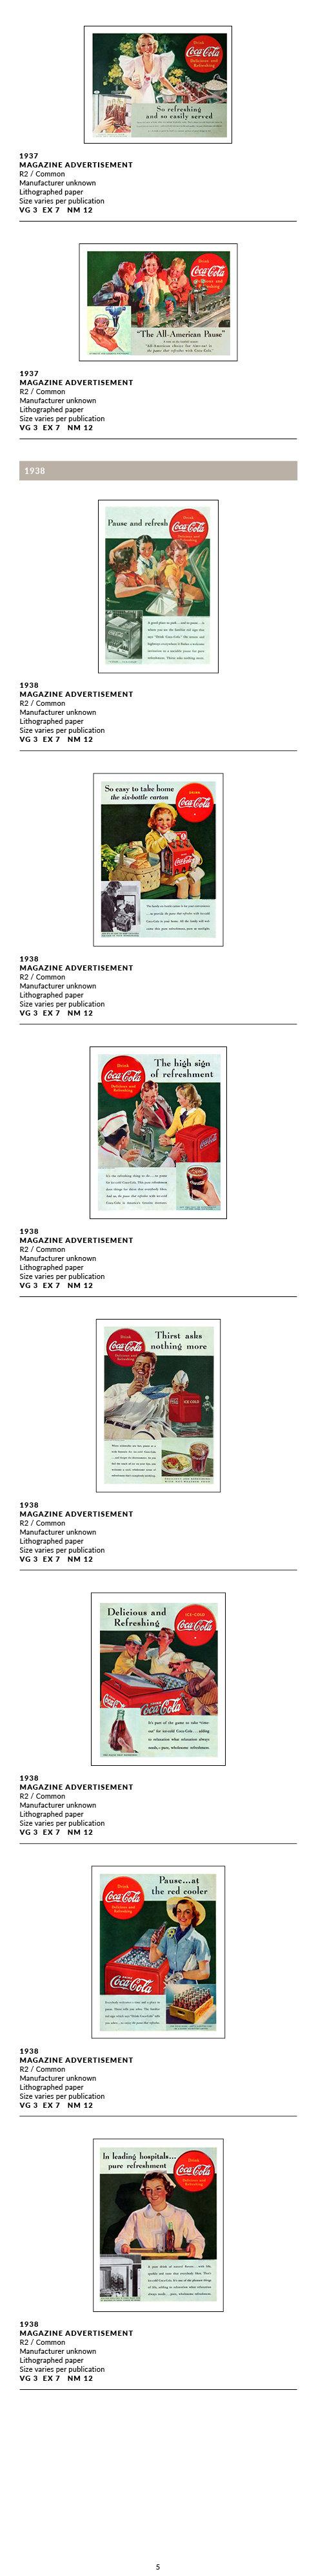 1935-39 Ads5.jpg